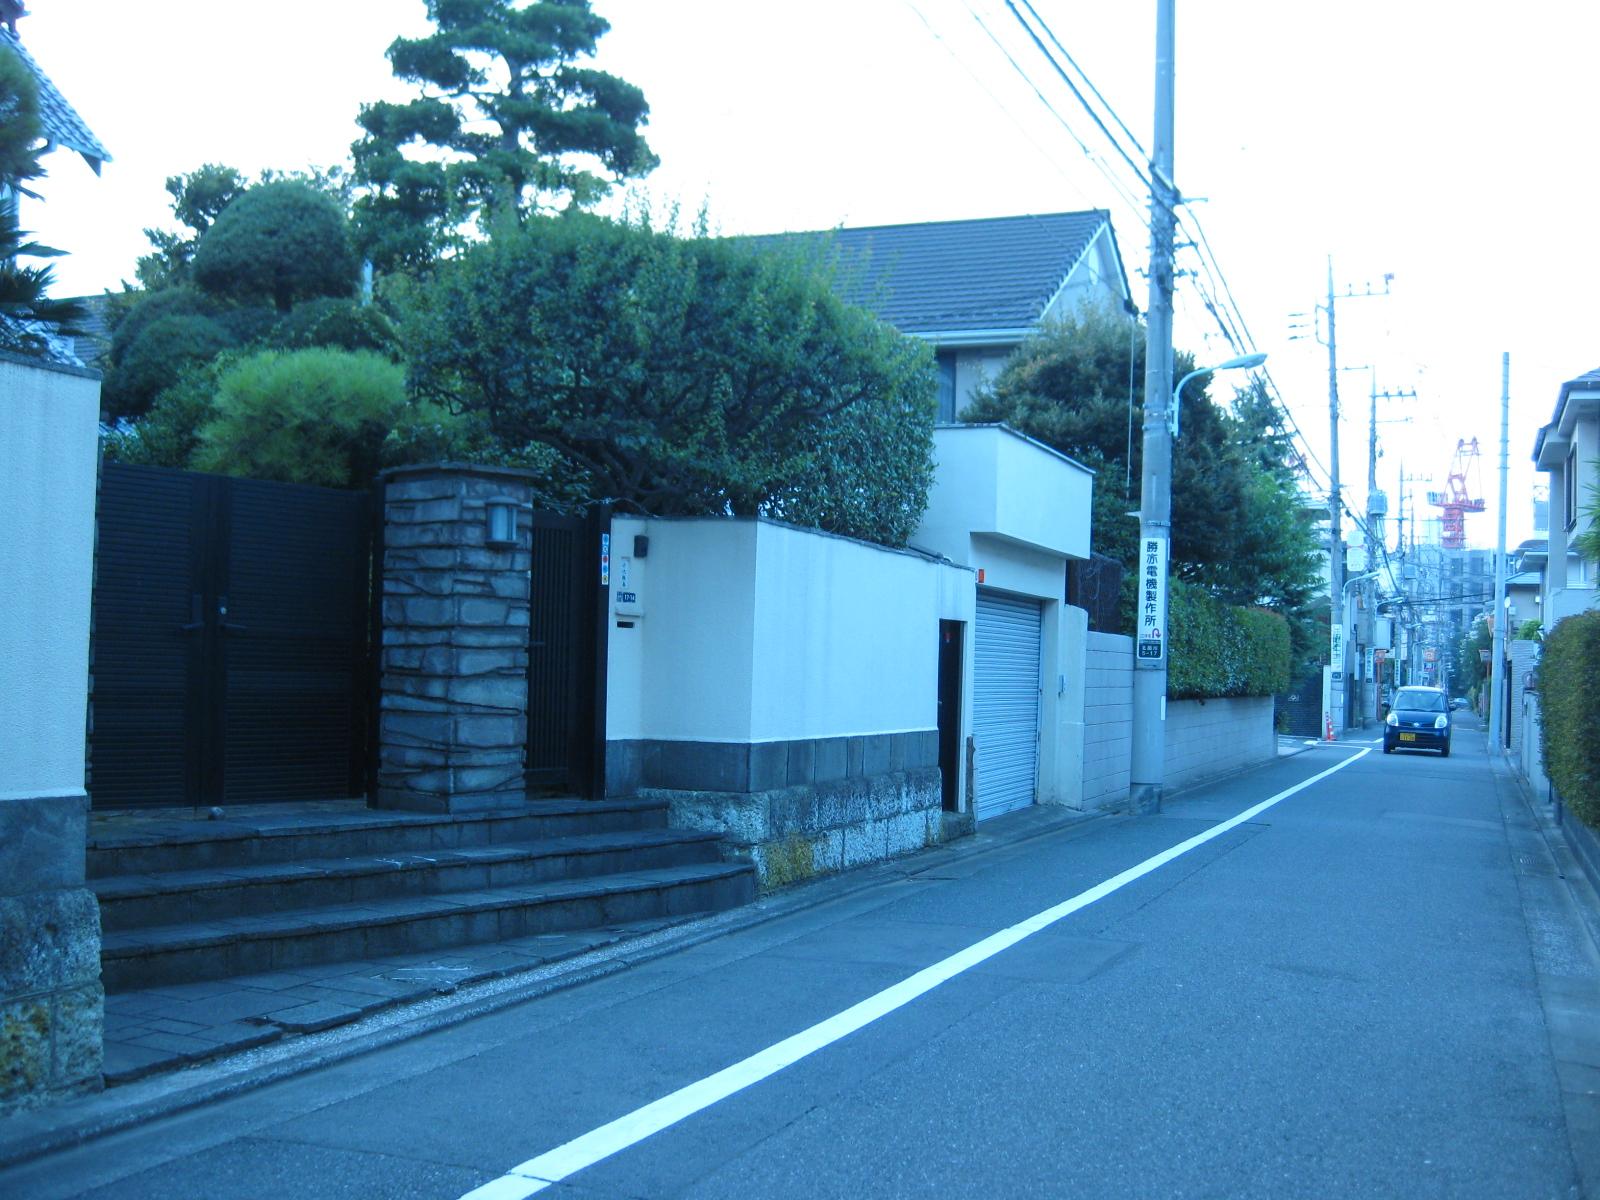 IMG_7006.JPG